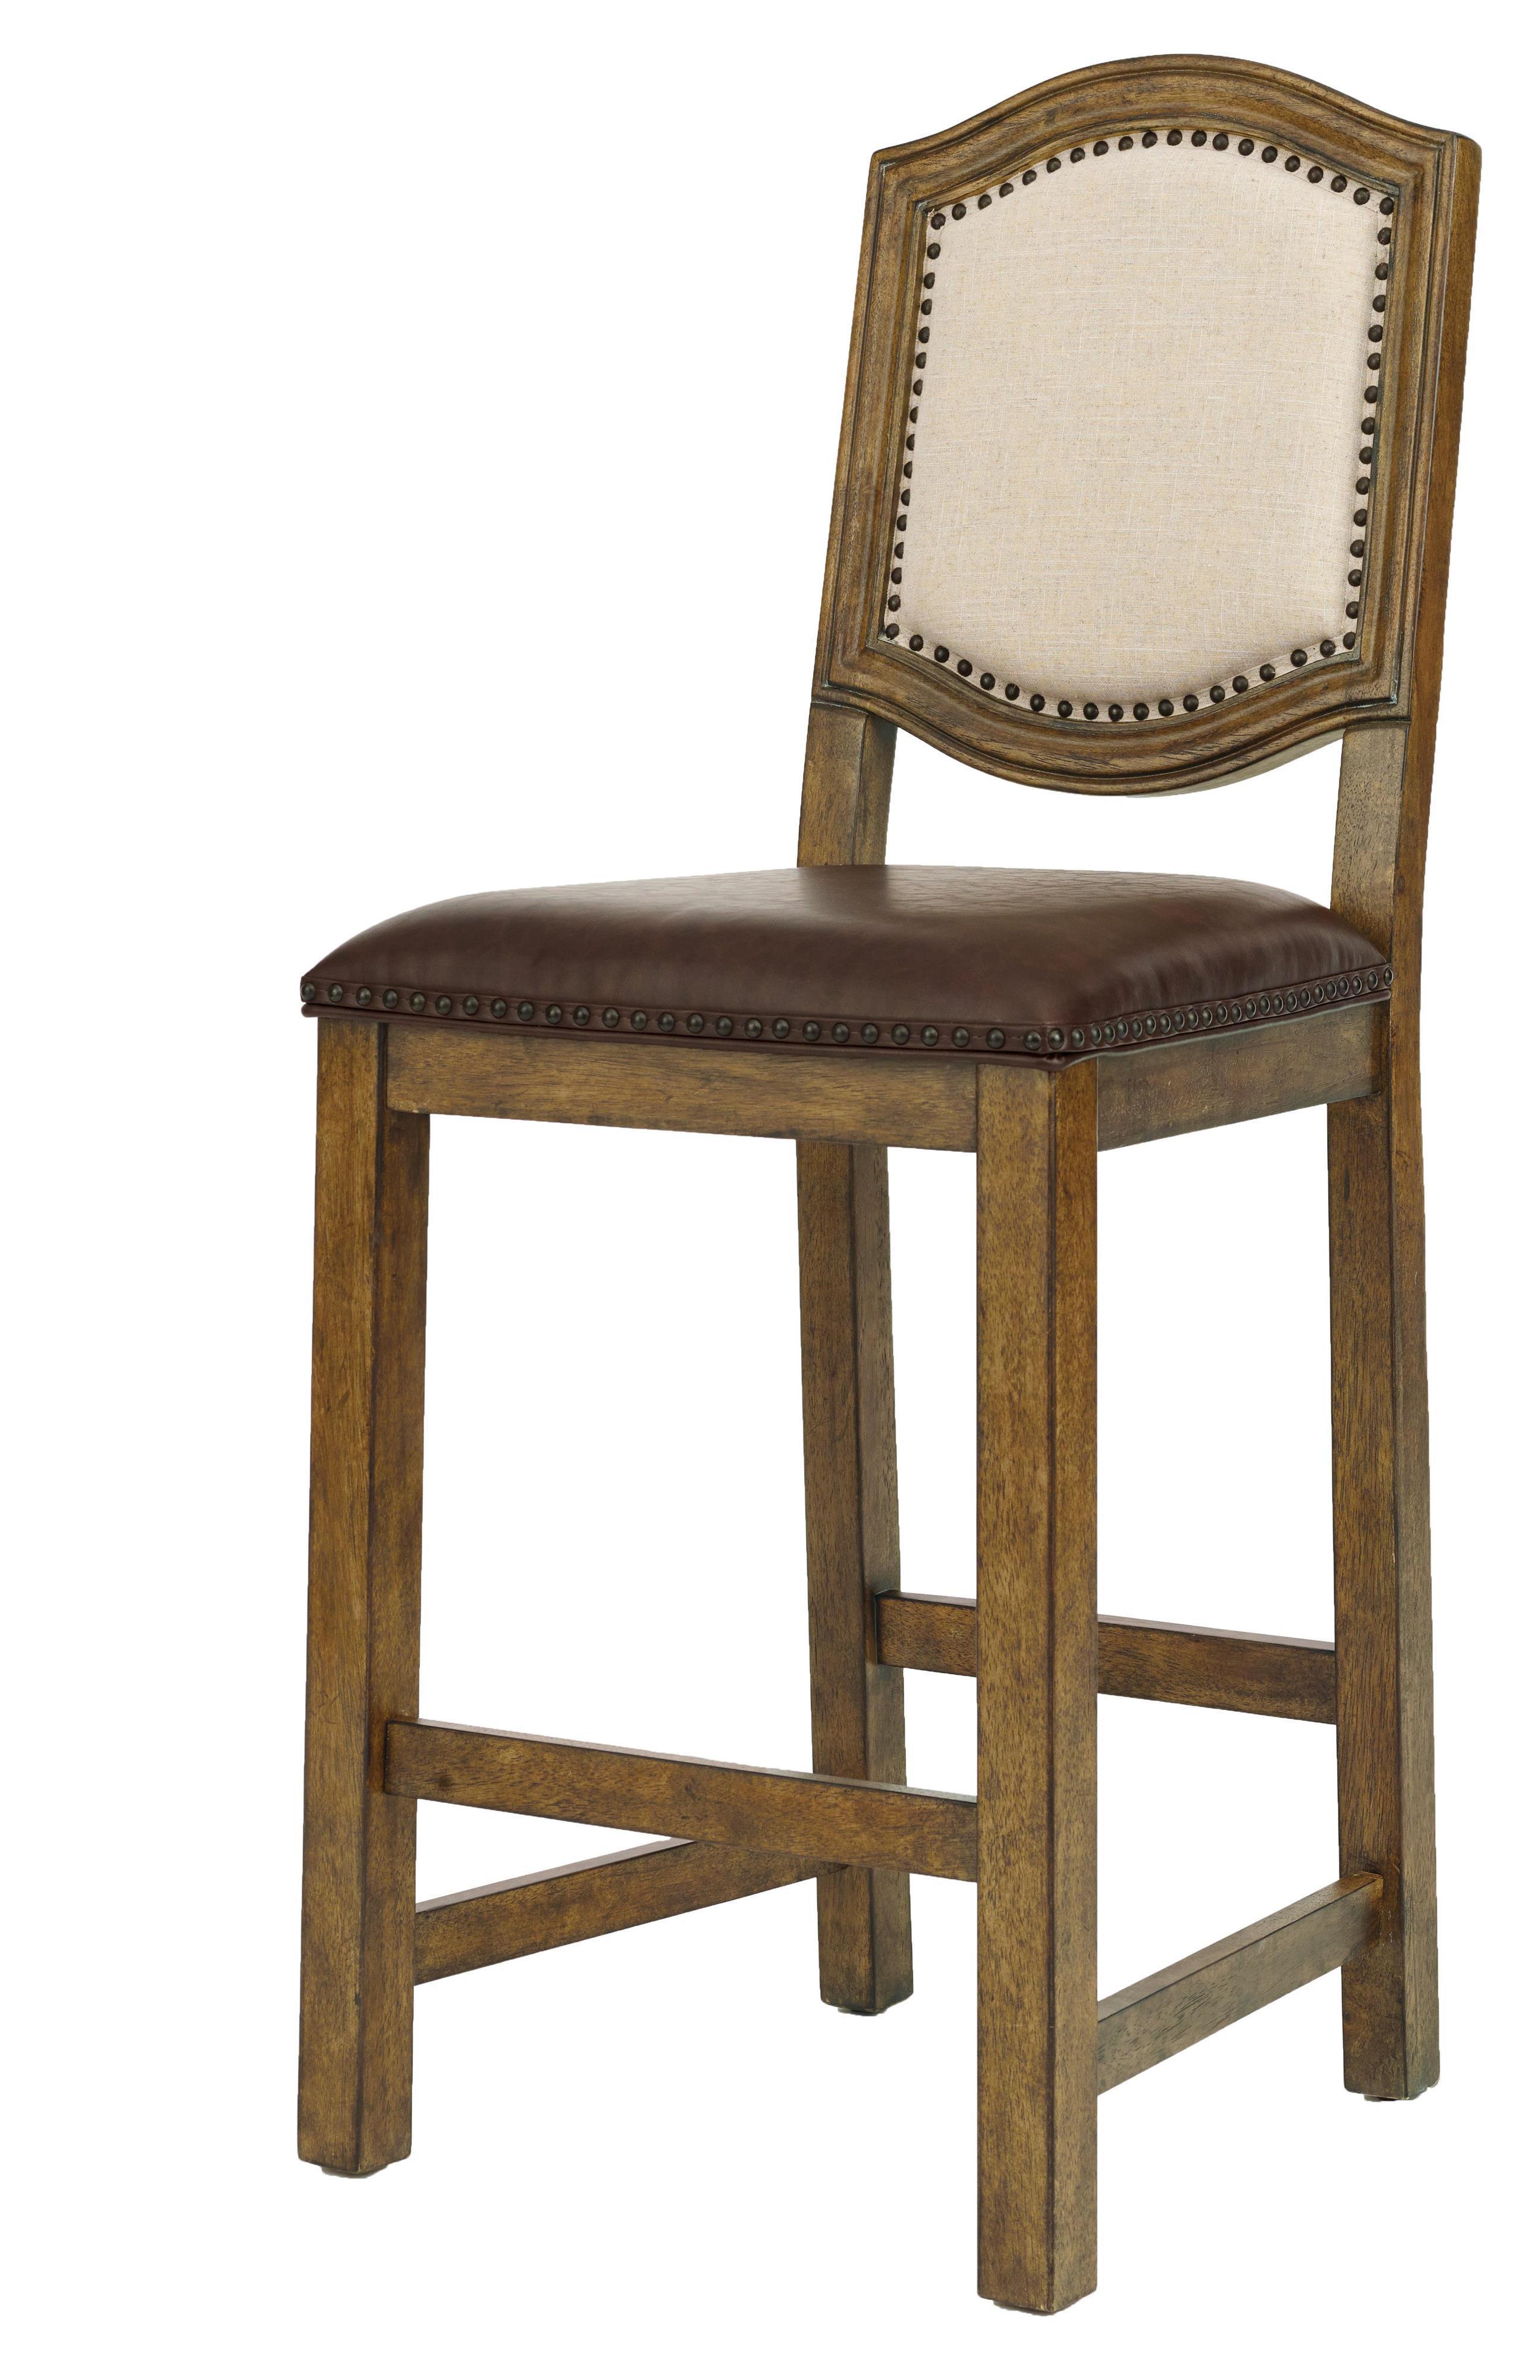 Belfort Select Virginia Mill Wood Frame Barstool - Item Number: 8854-170